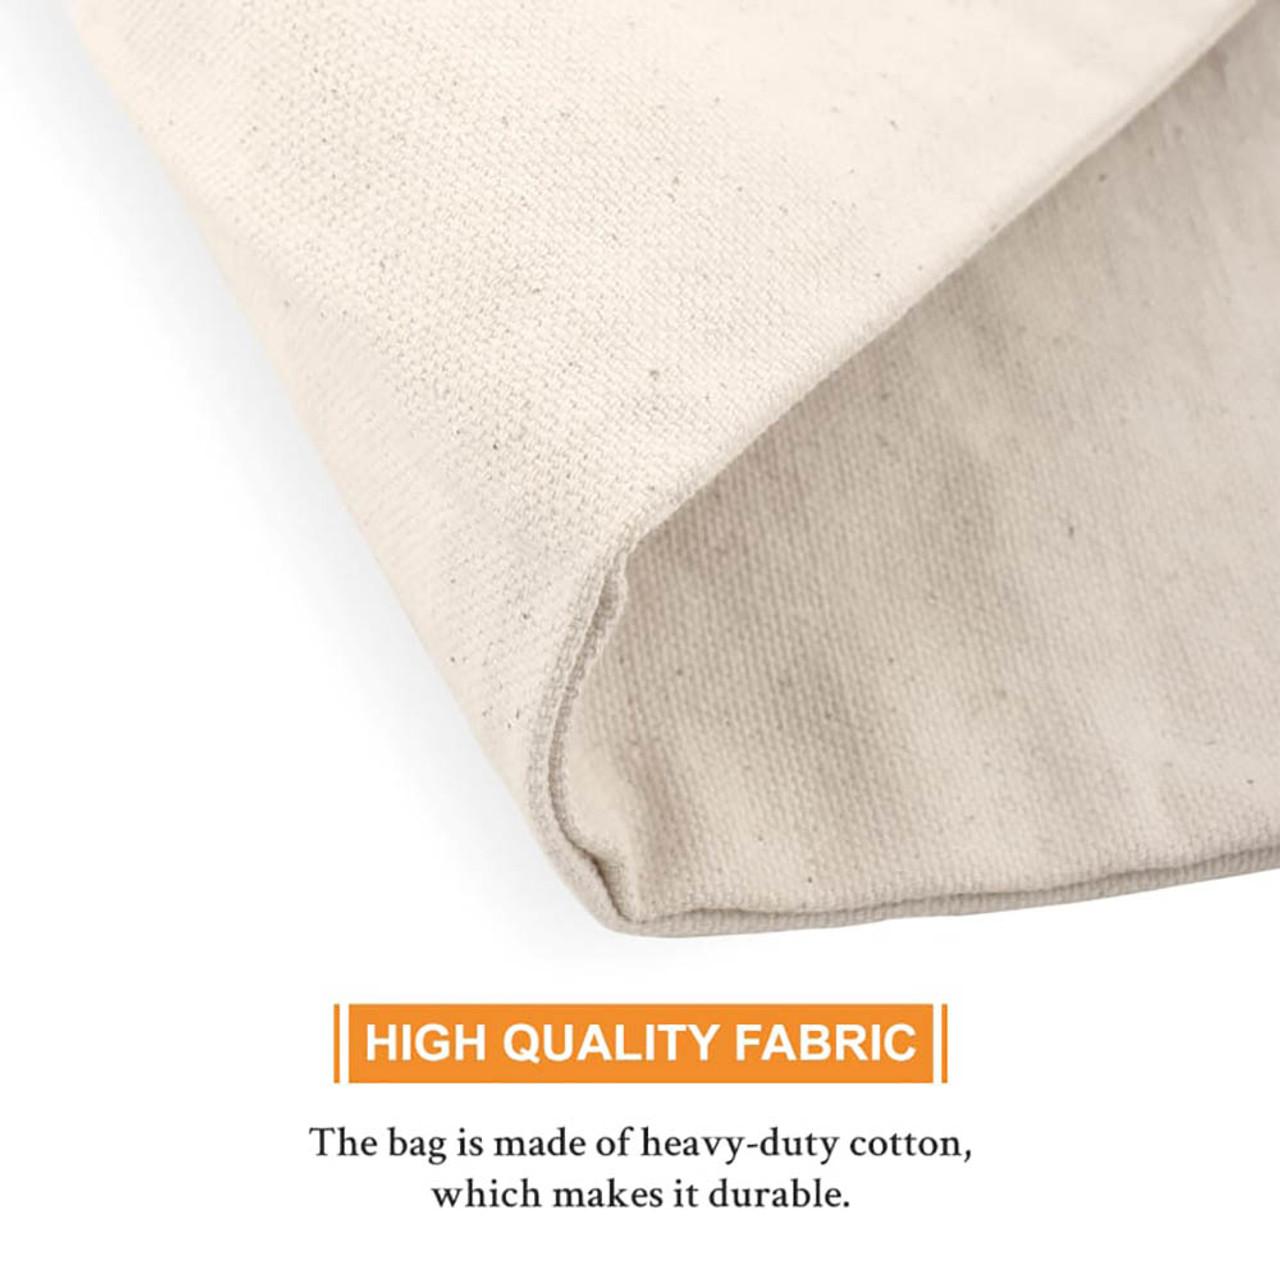 "UBICON Heavy Duty Cotton Bag Medium 8"" x 14"""